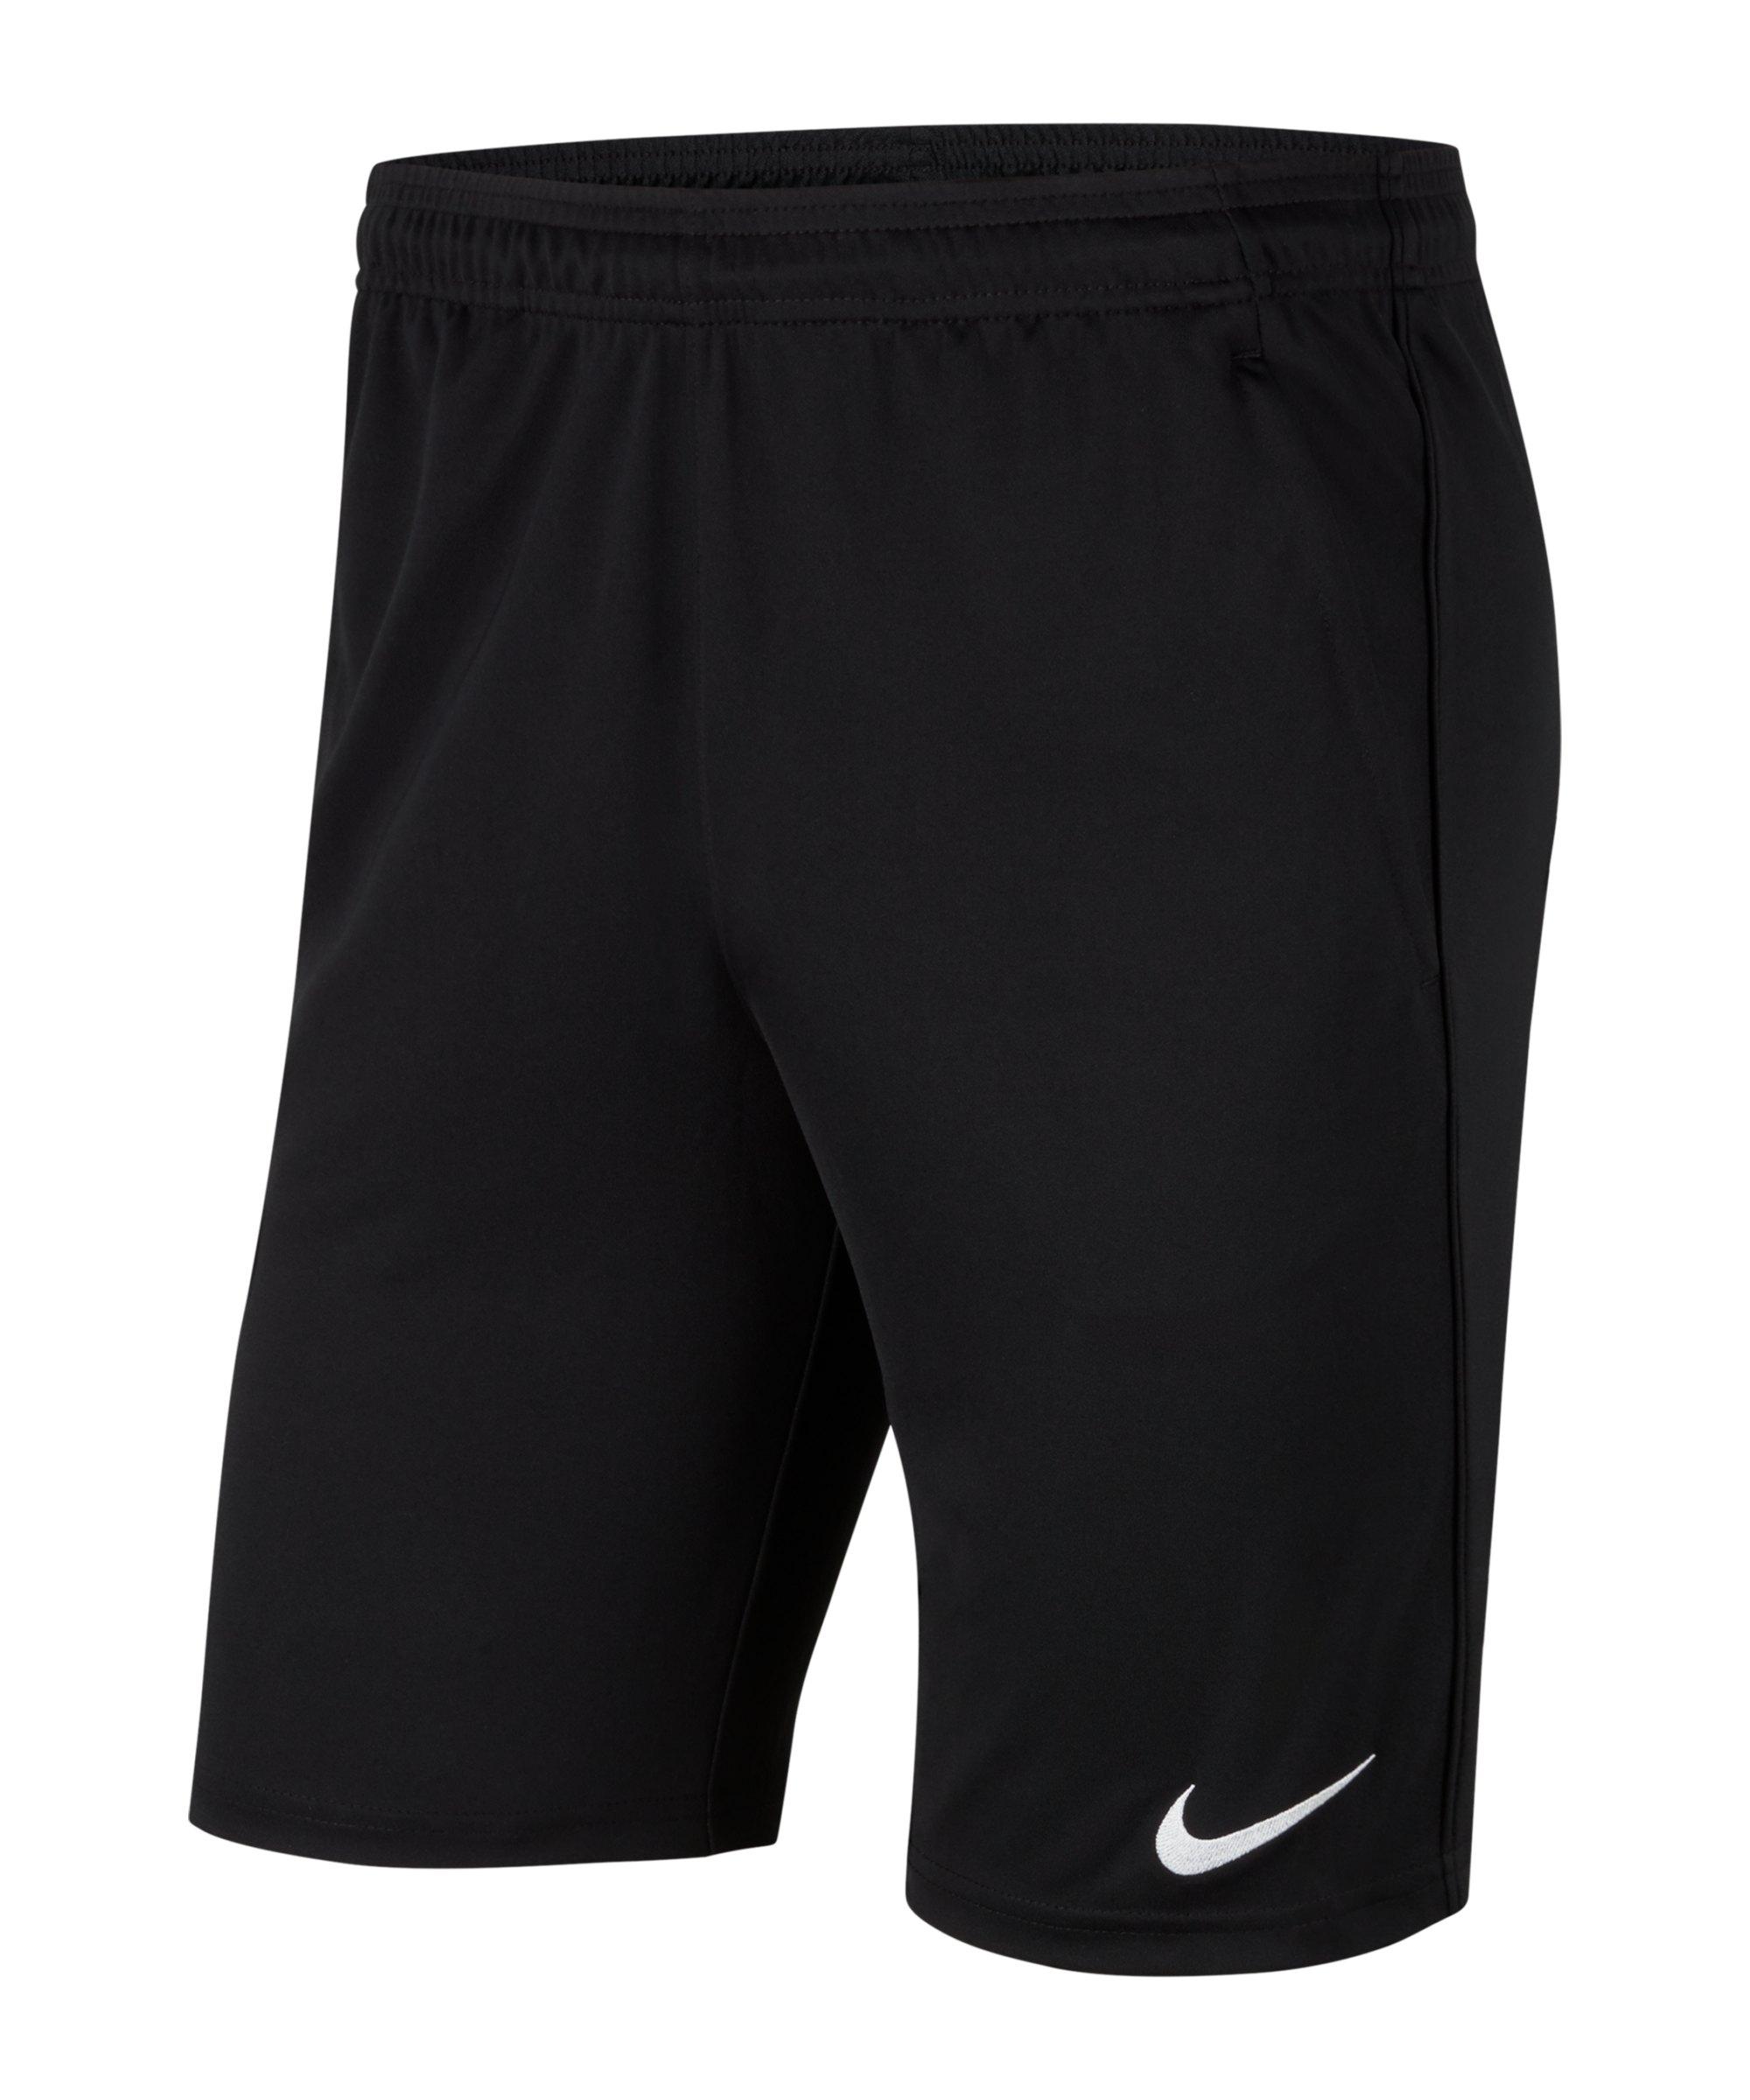 Nike Park 20 Knit Short Kids Schwarz Weiss F010 - schwarz